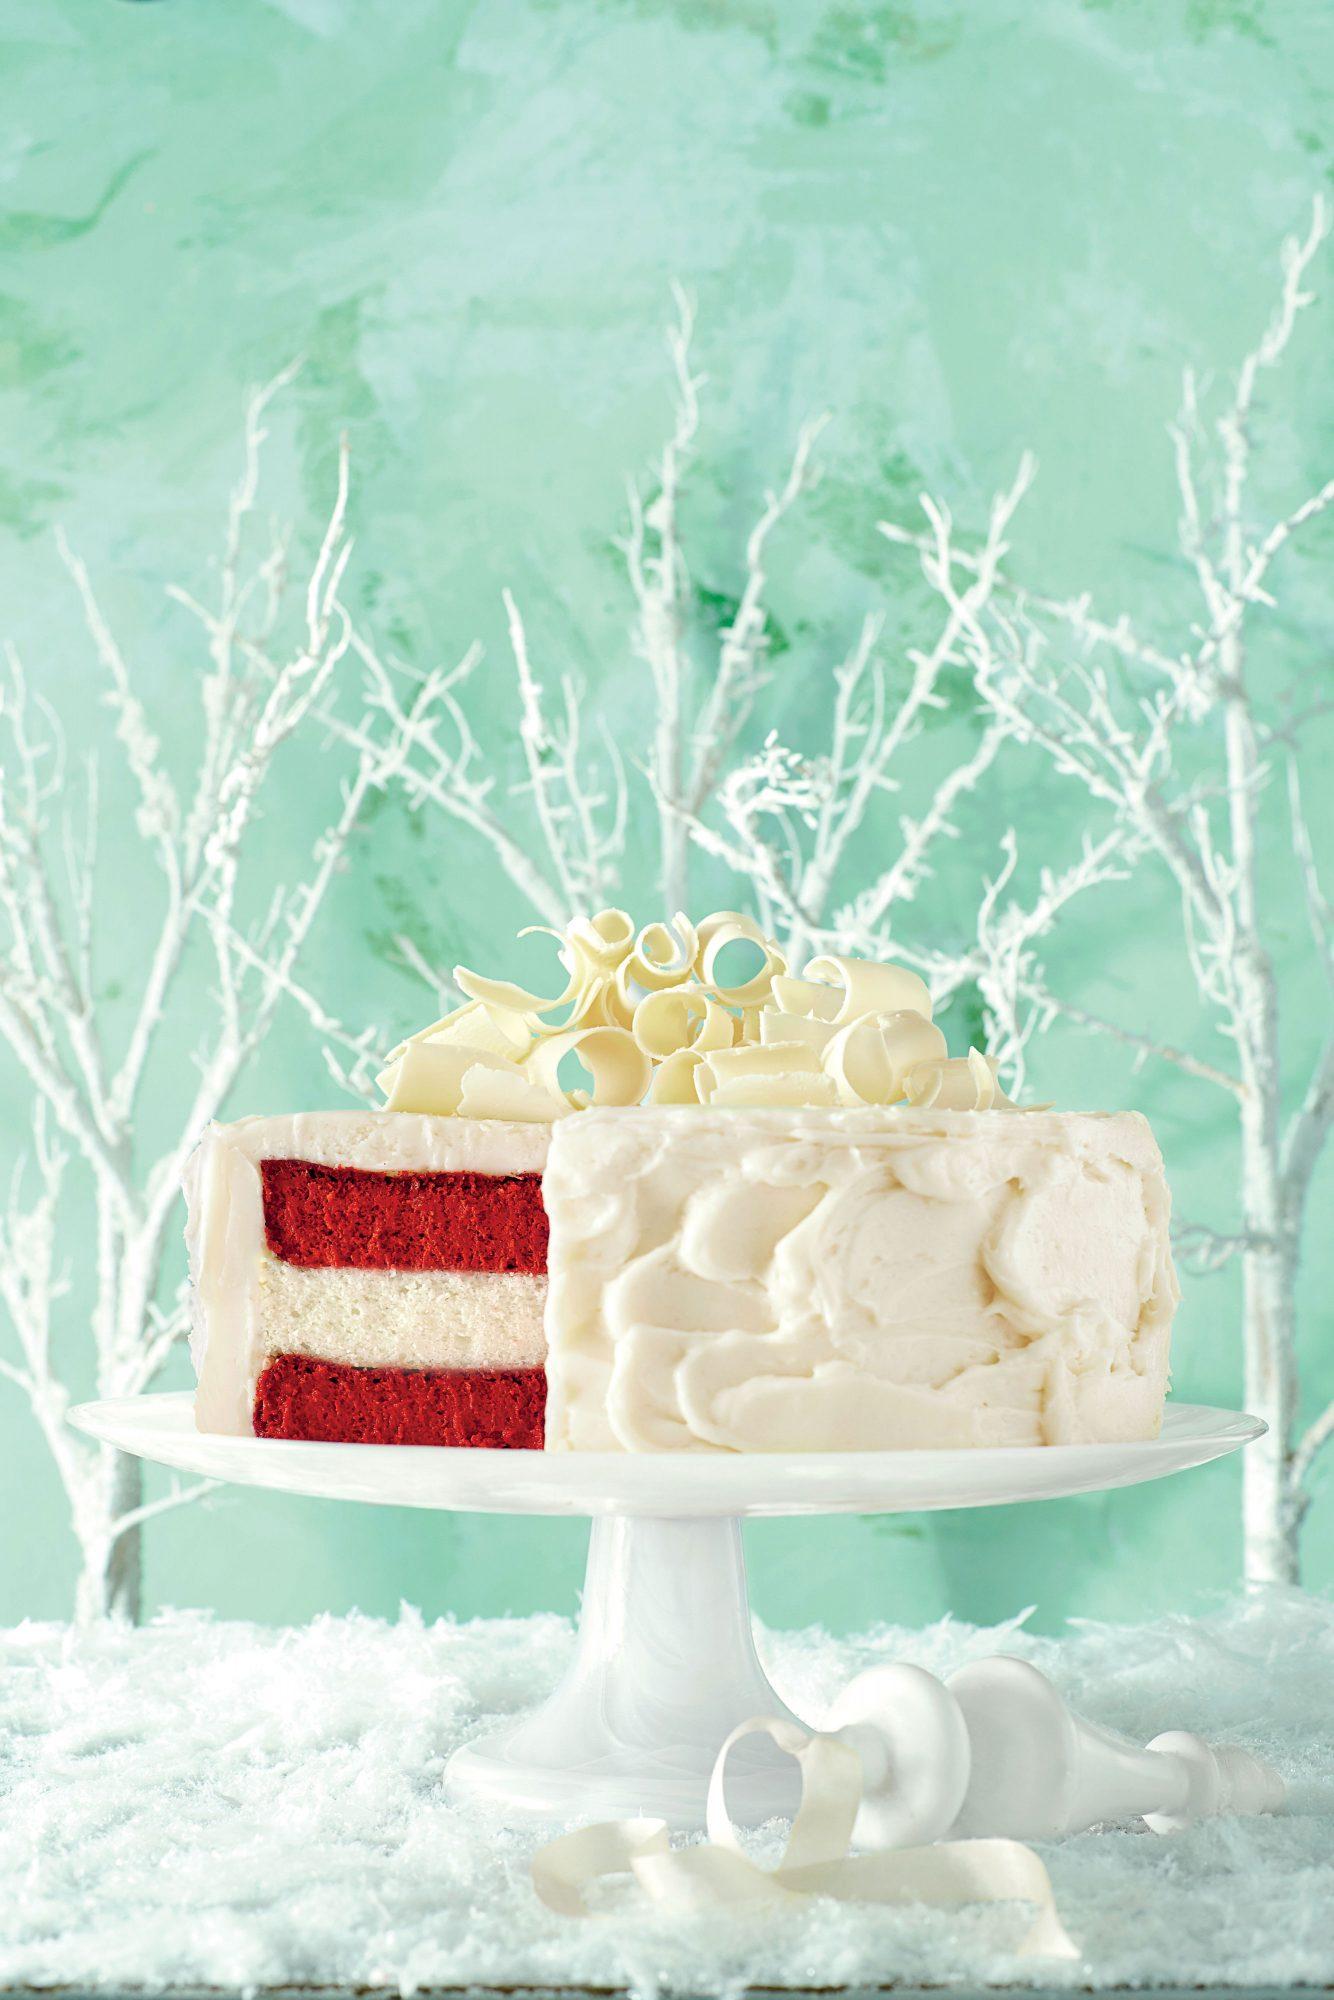 Red Velvet Cheesecake-Vanilla Cake with Cream Cheese Frosting image